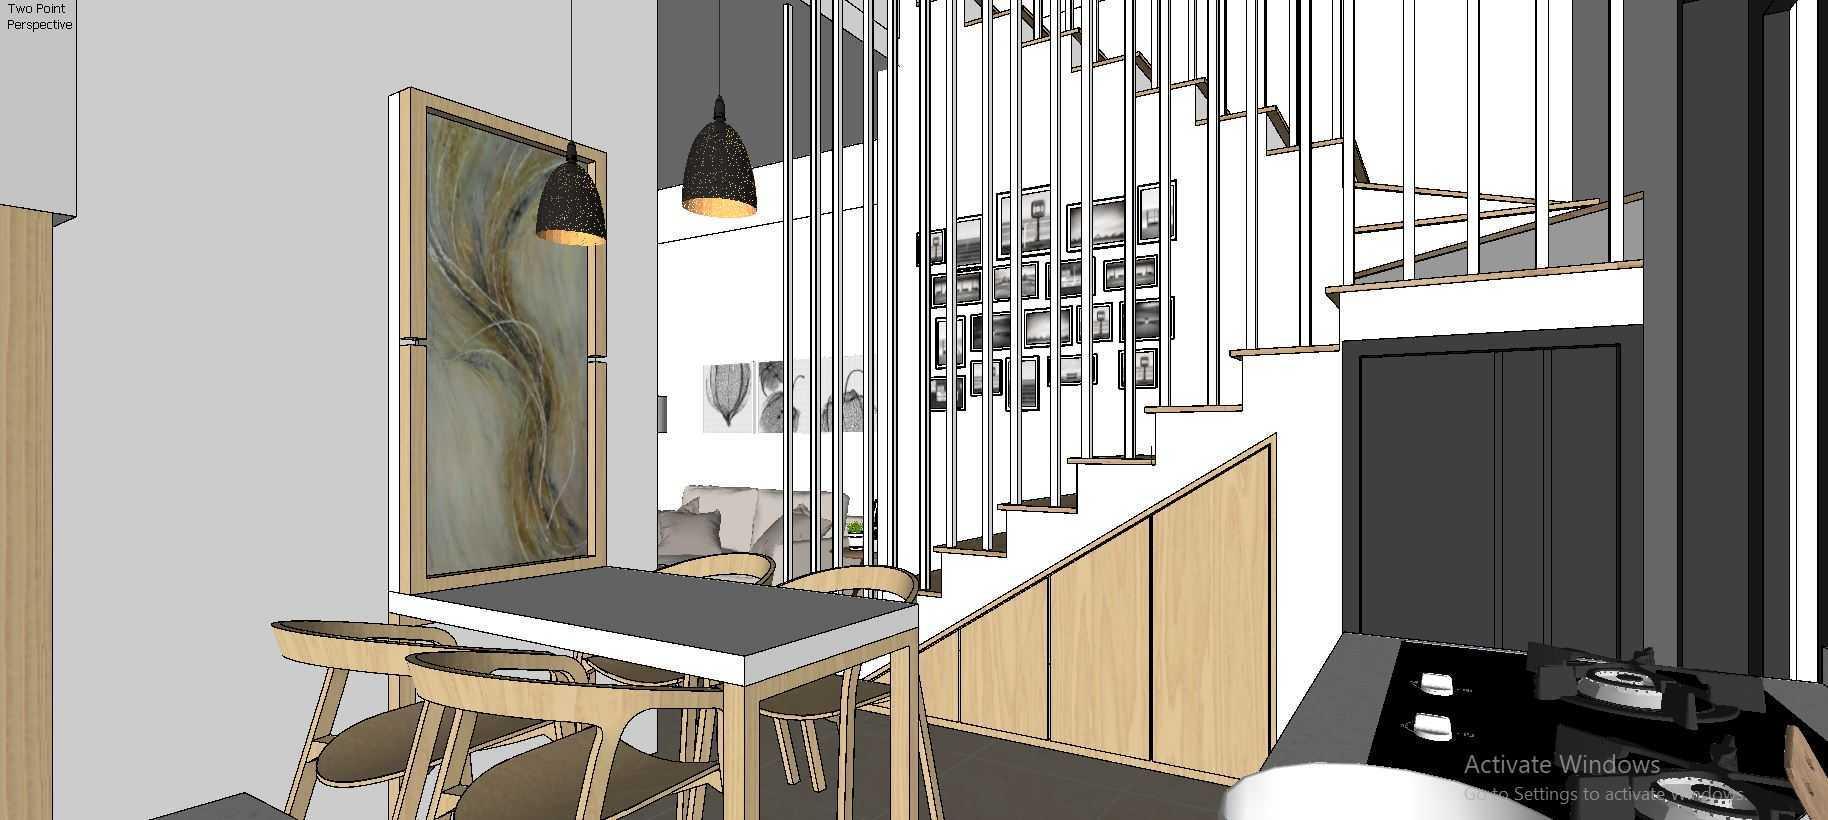 Arta Studio Billa's House Kec. Sawangan, Kota Depok, Jawa Barat, Indonesia Kec. Sawangan, Kota Depok, Jawa Barat, Indonesia Arief-Muhammad-Nasution-Billas-House  108273